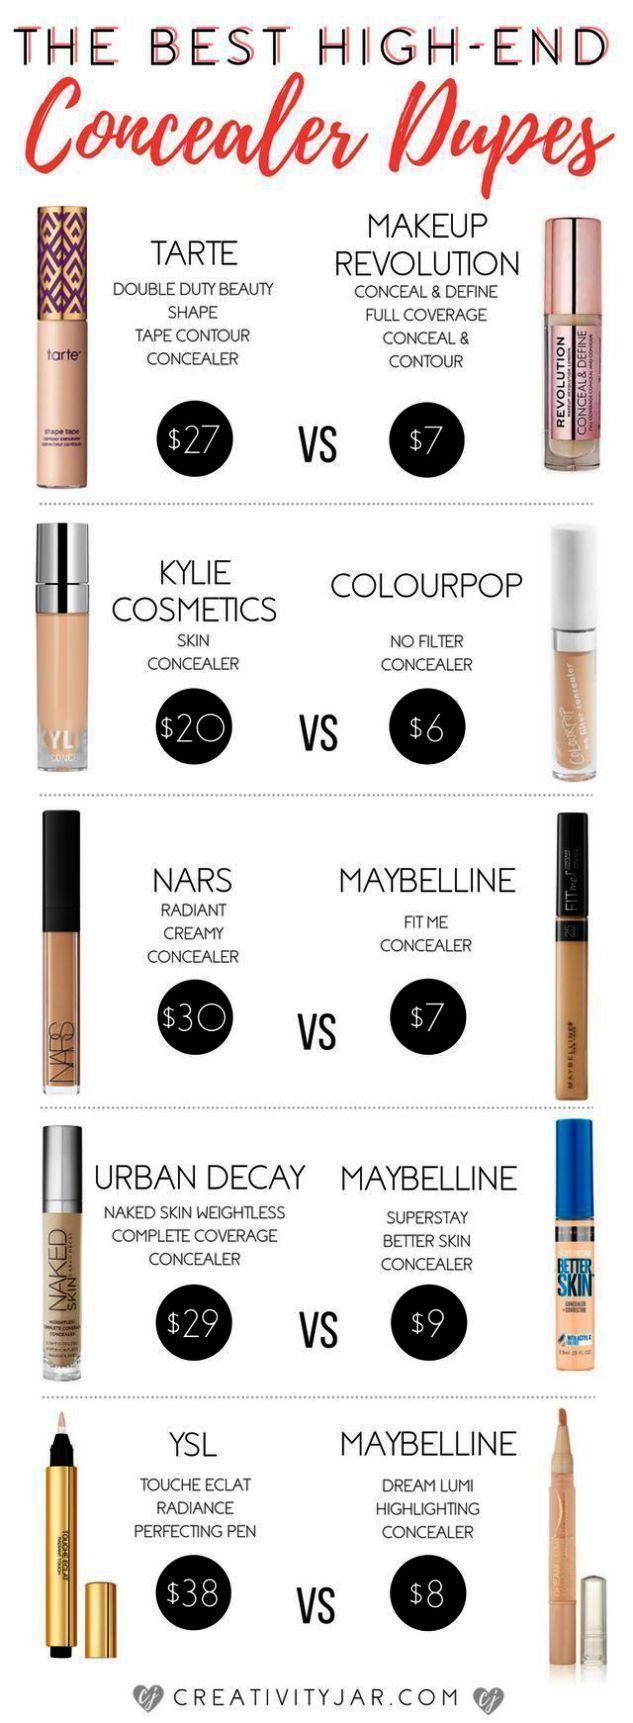 Makeup Revolution highlighter palette considering price in